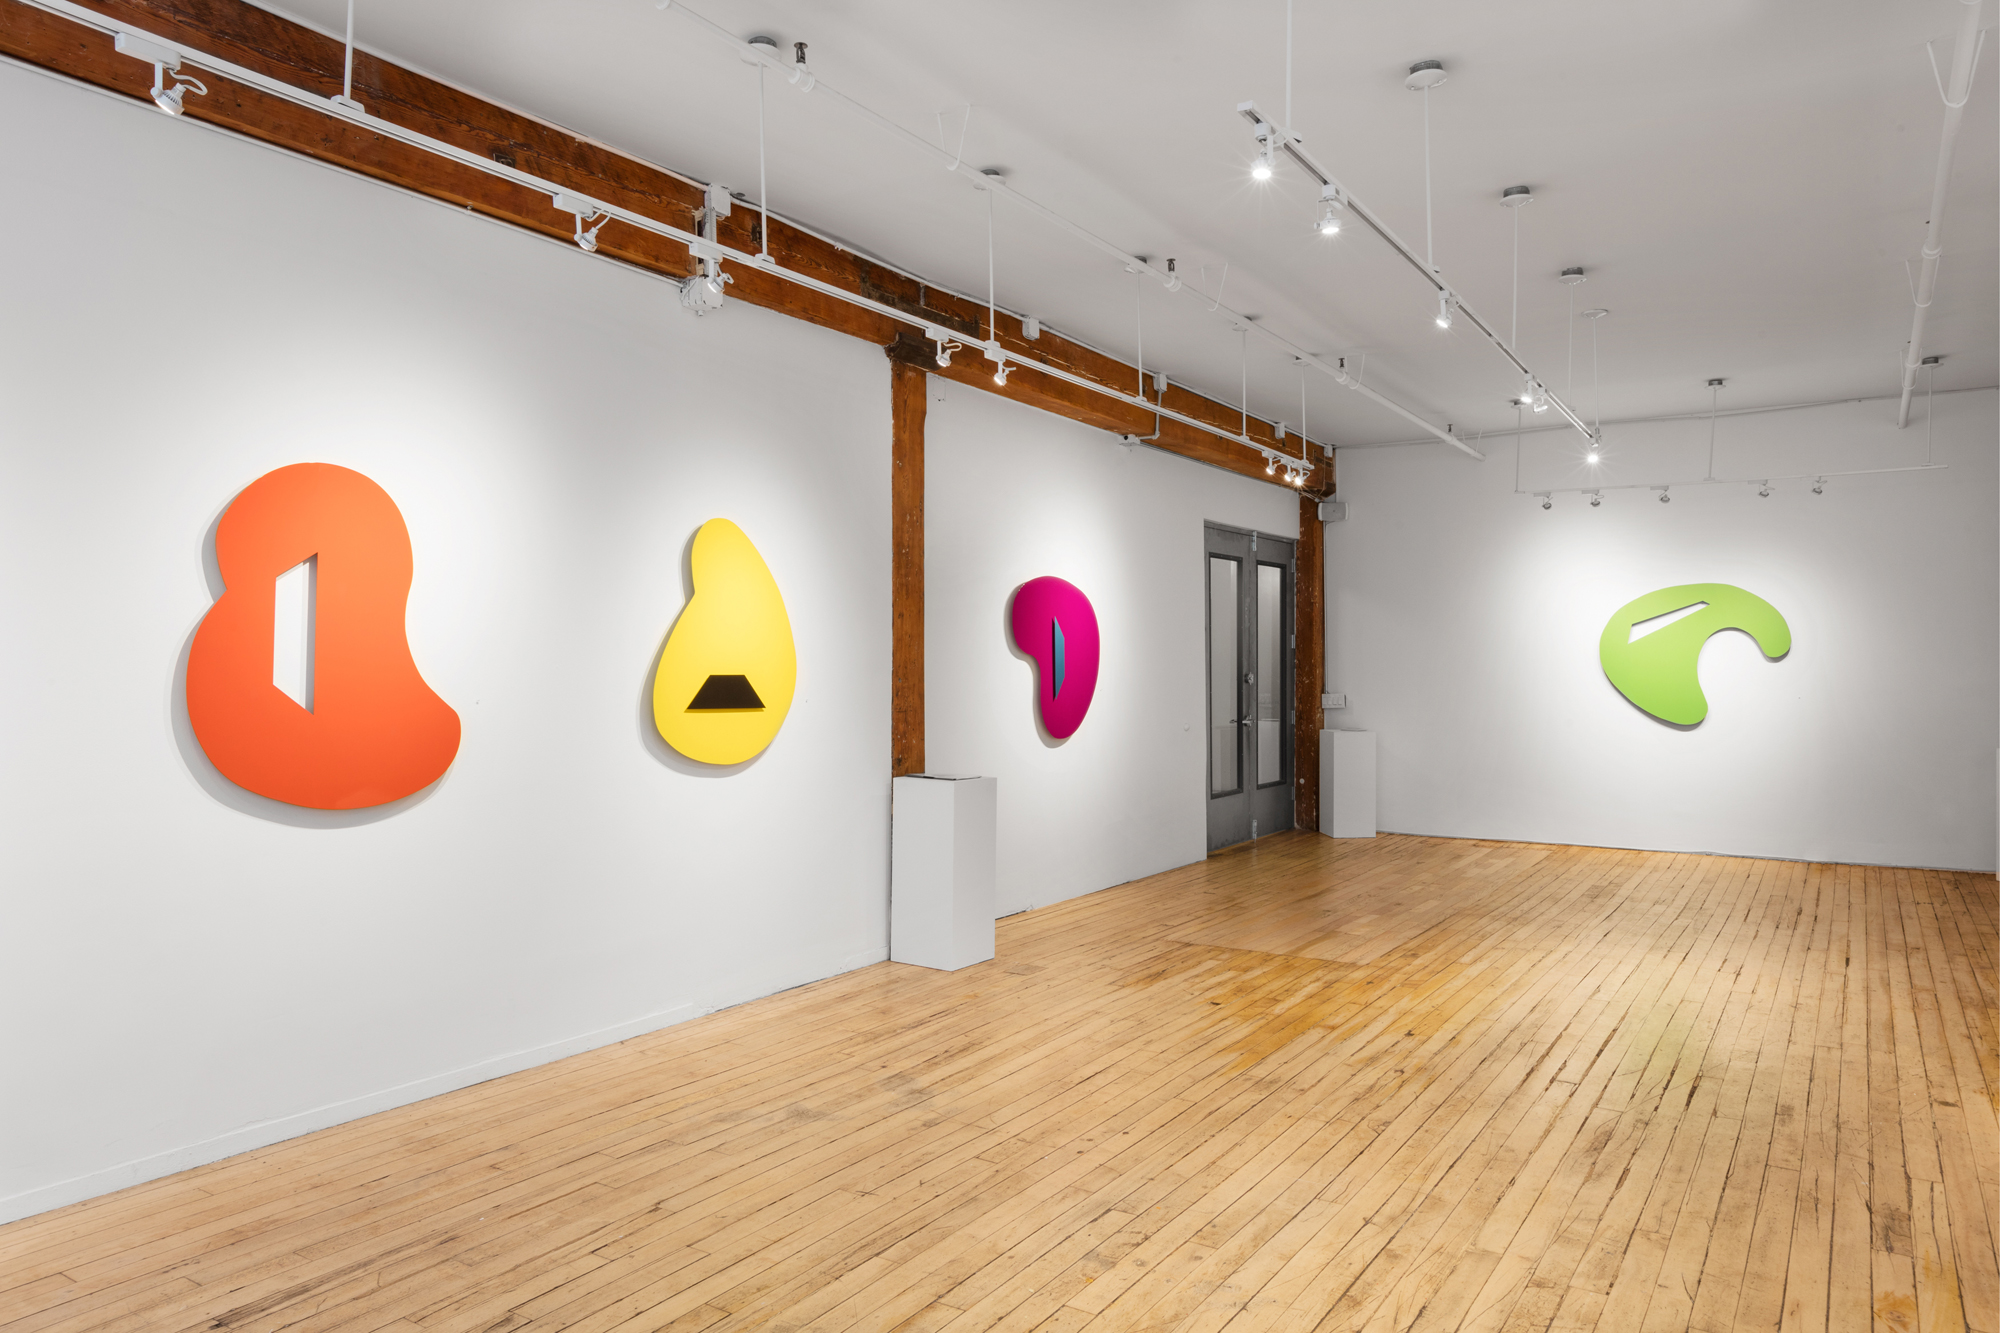 KATINKA MANN Colors Carter Burden Gallery